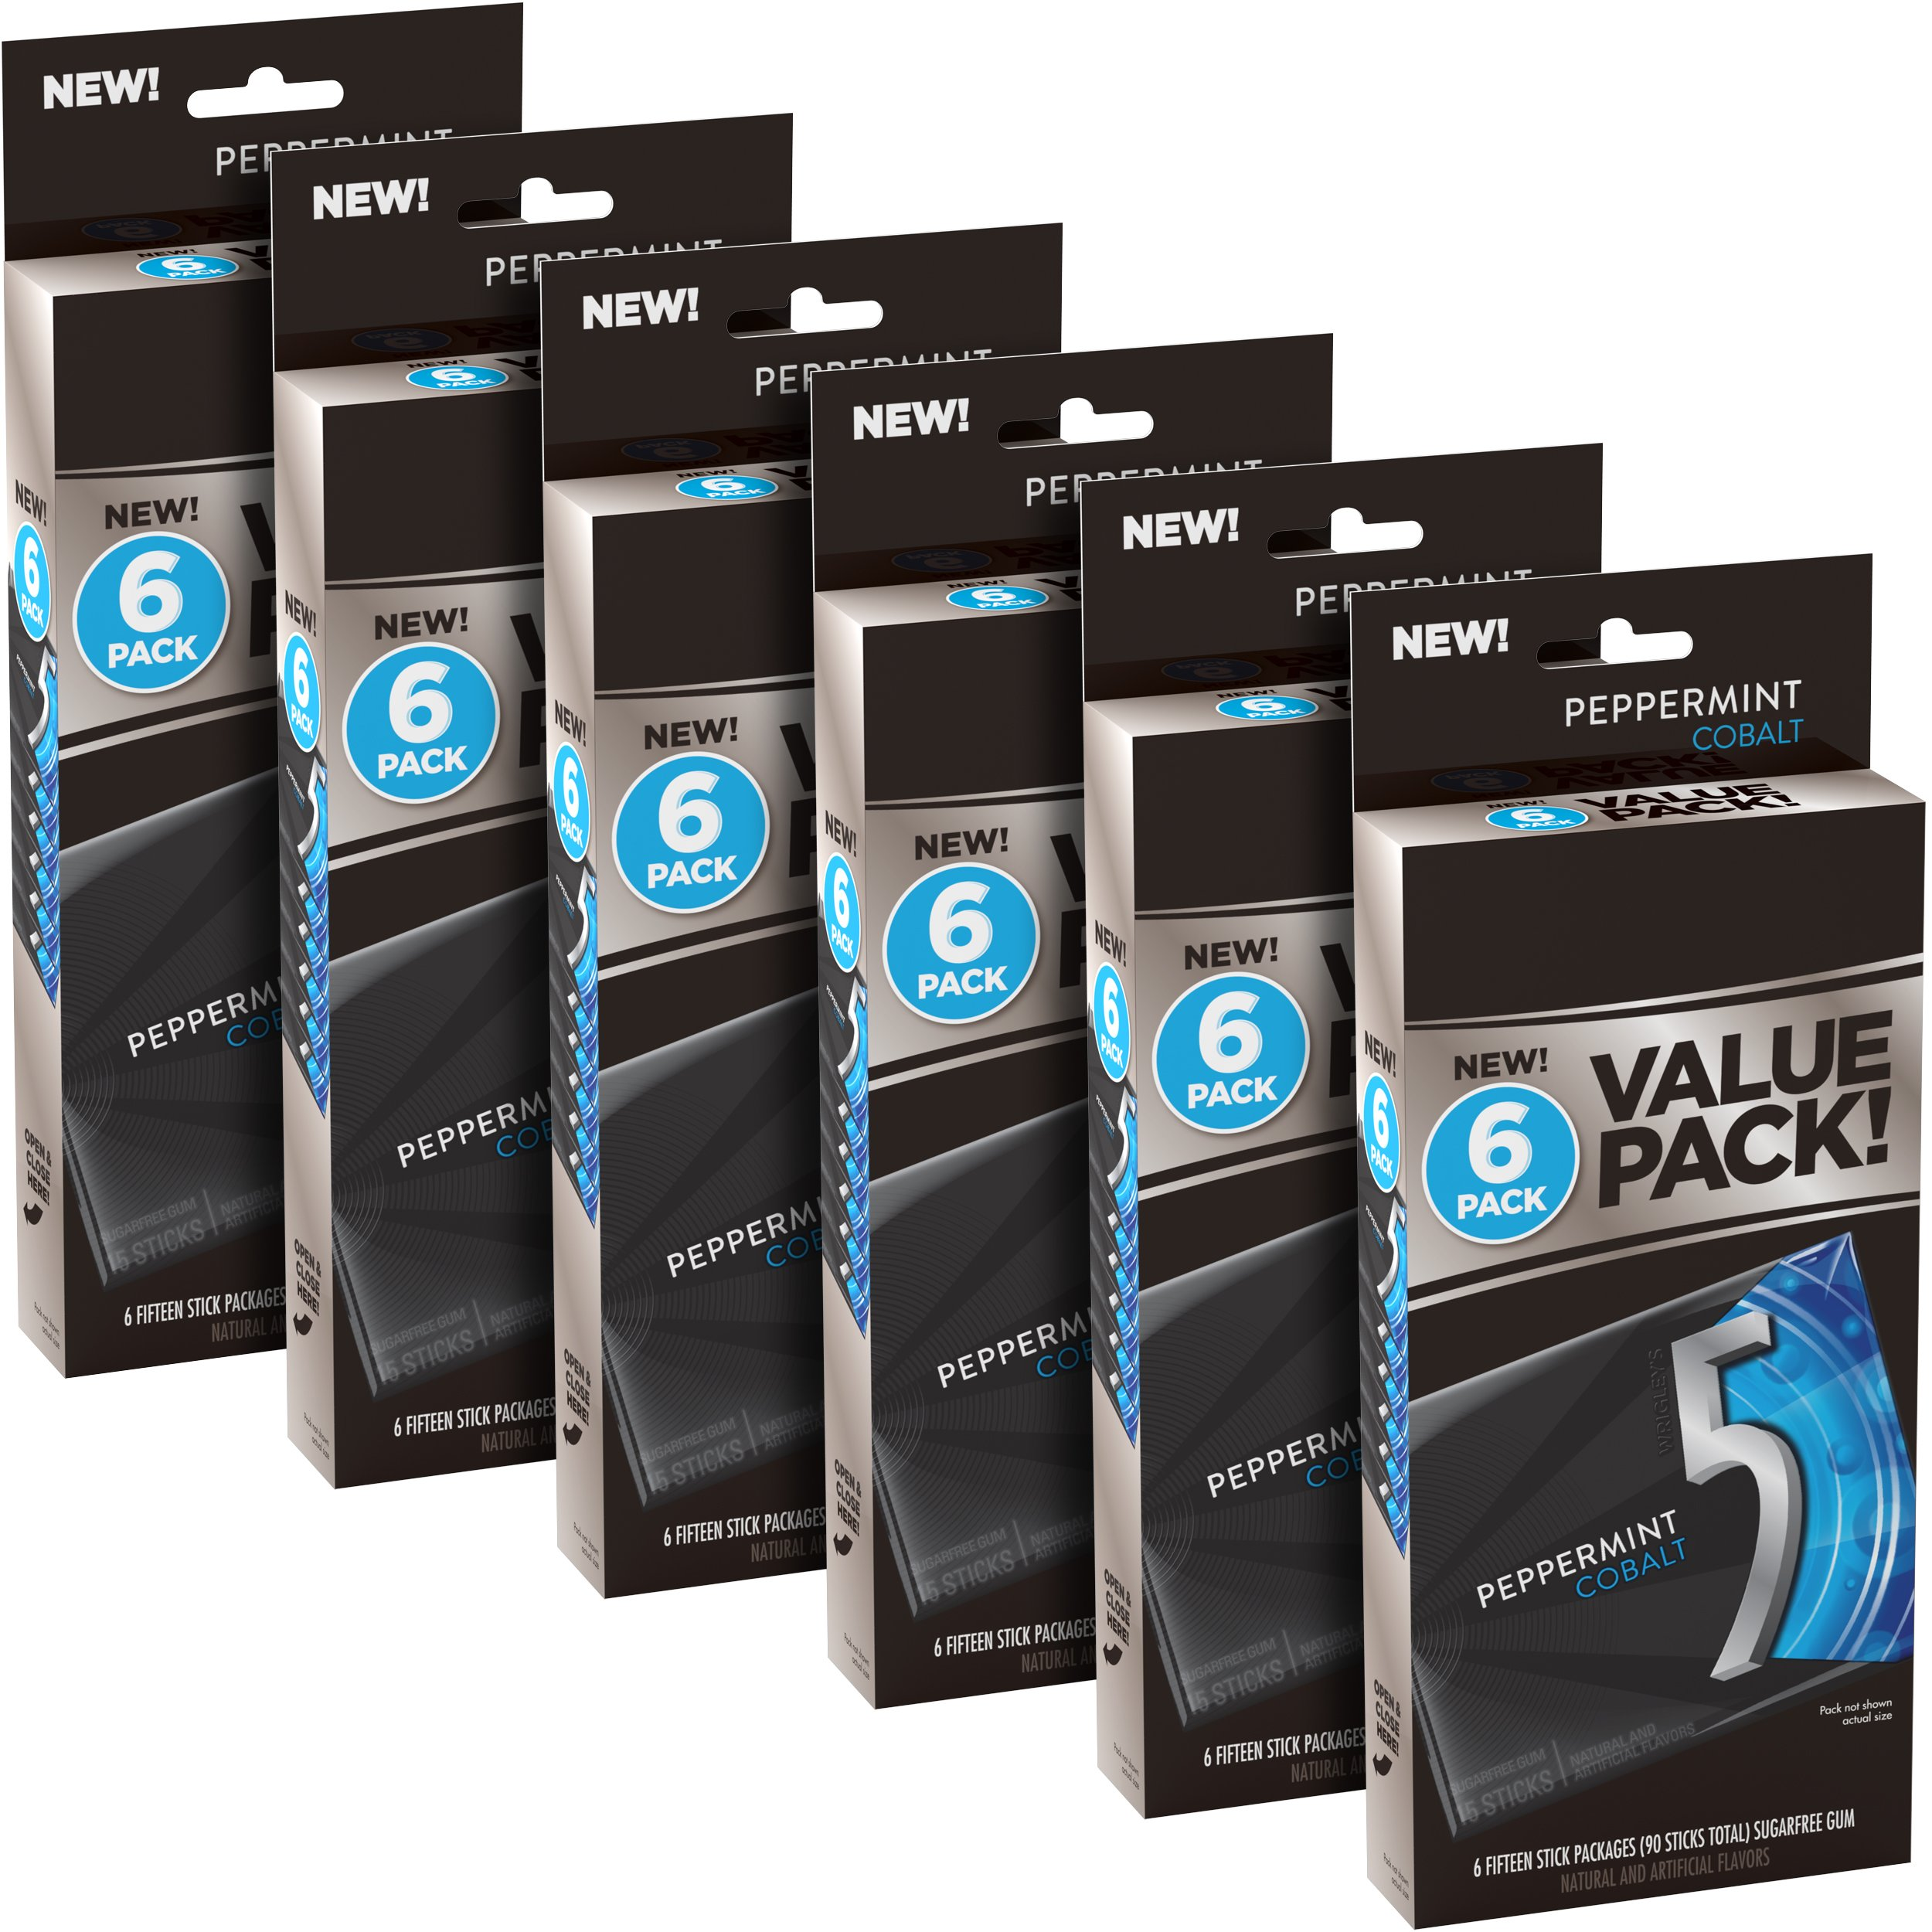 5 Gum Cobalt Peppermint Sugarfree Gum, 6 Value Packs, (36 packs total)